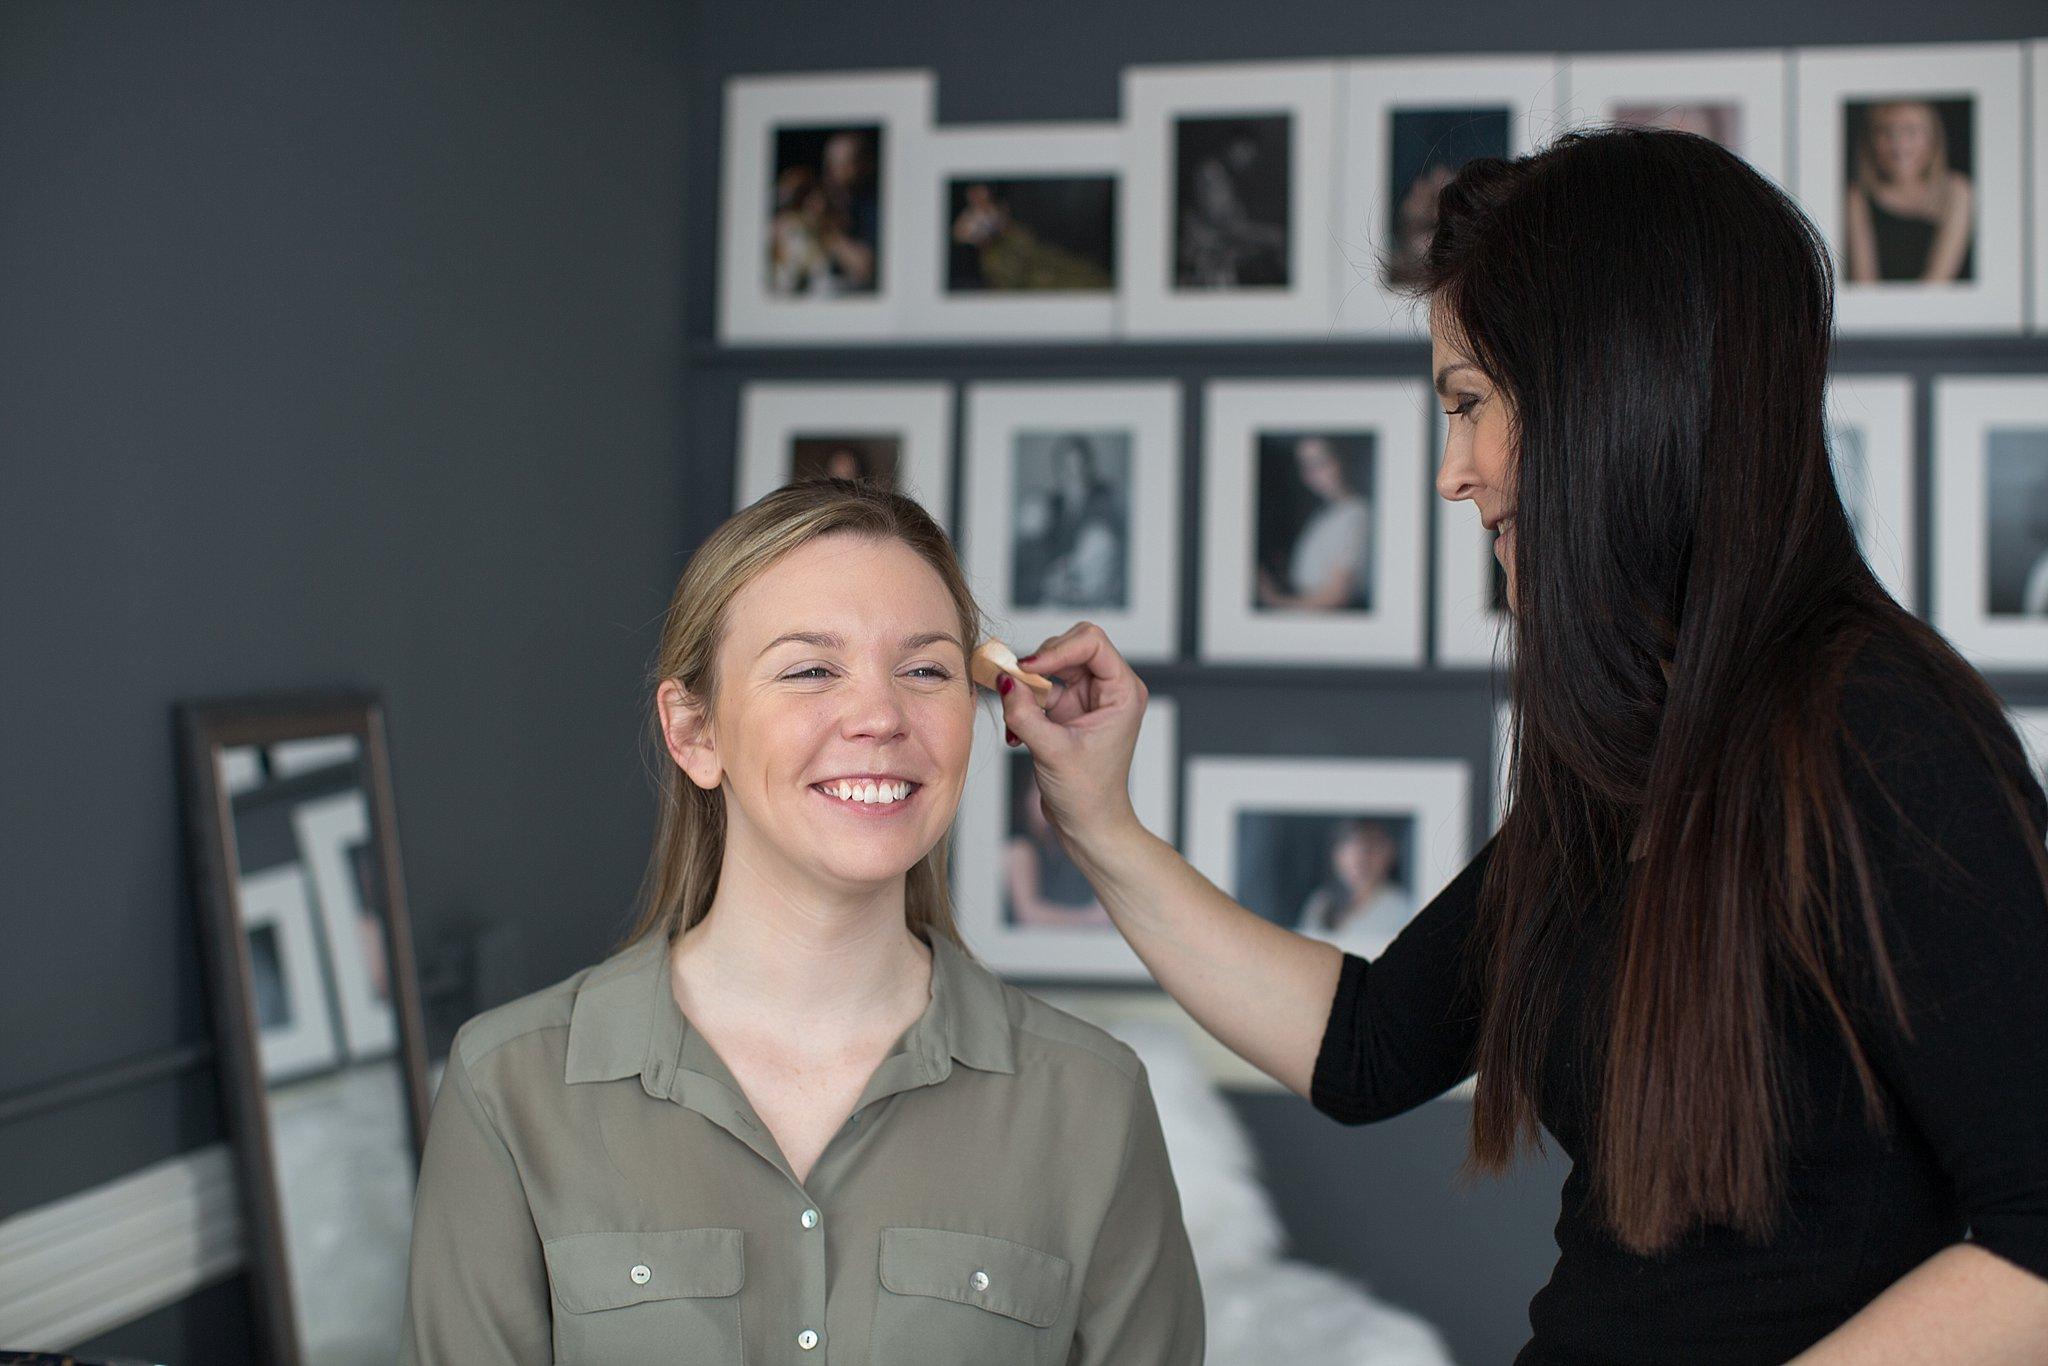 Behind the scenes - Shaylah - hair and makeup_0001.jpg